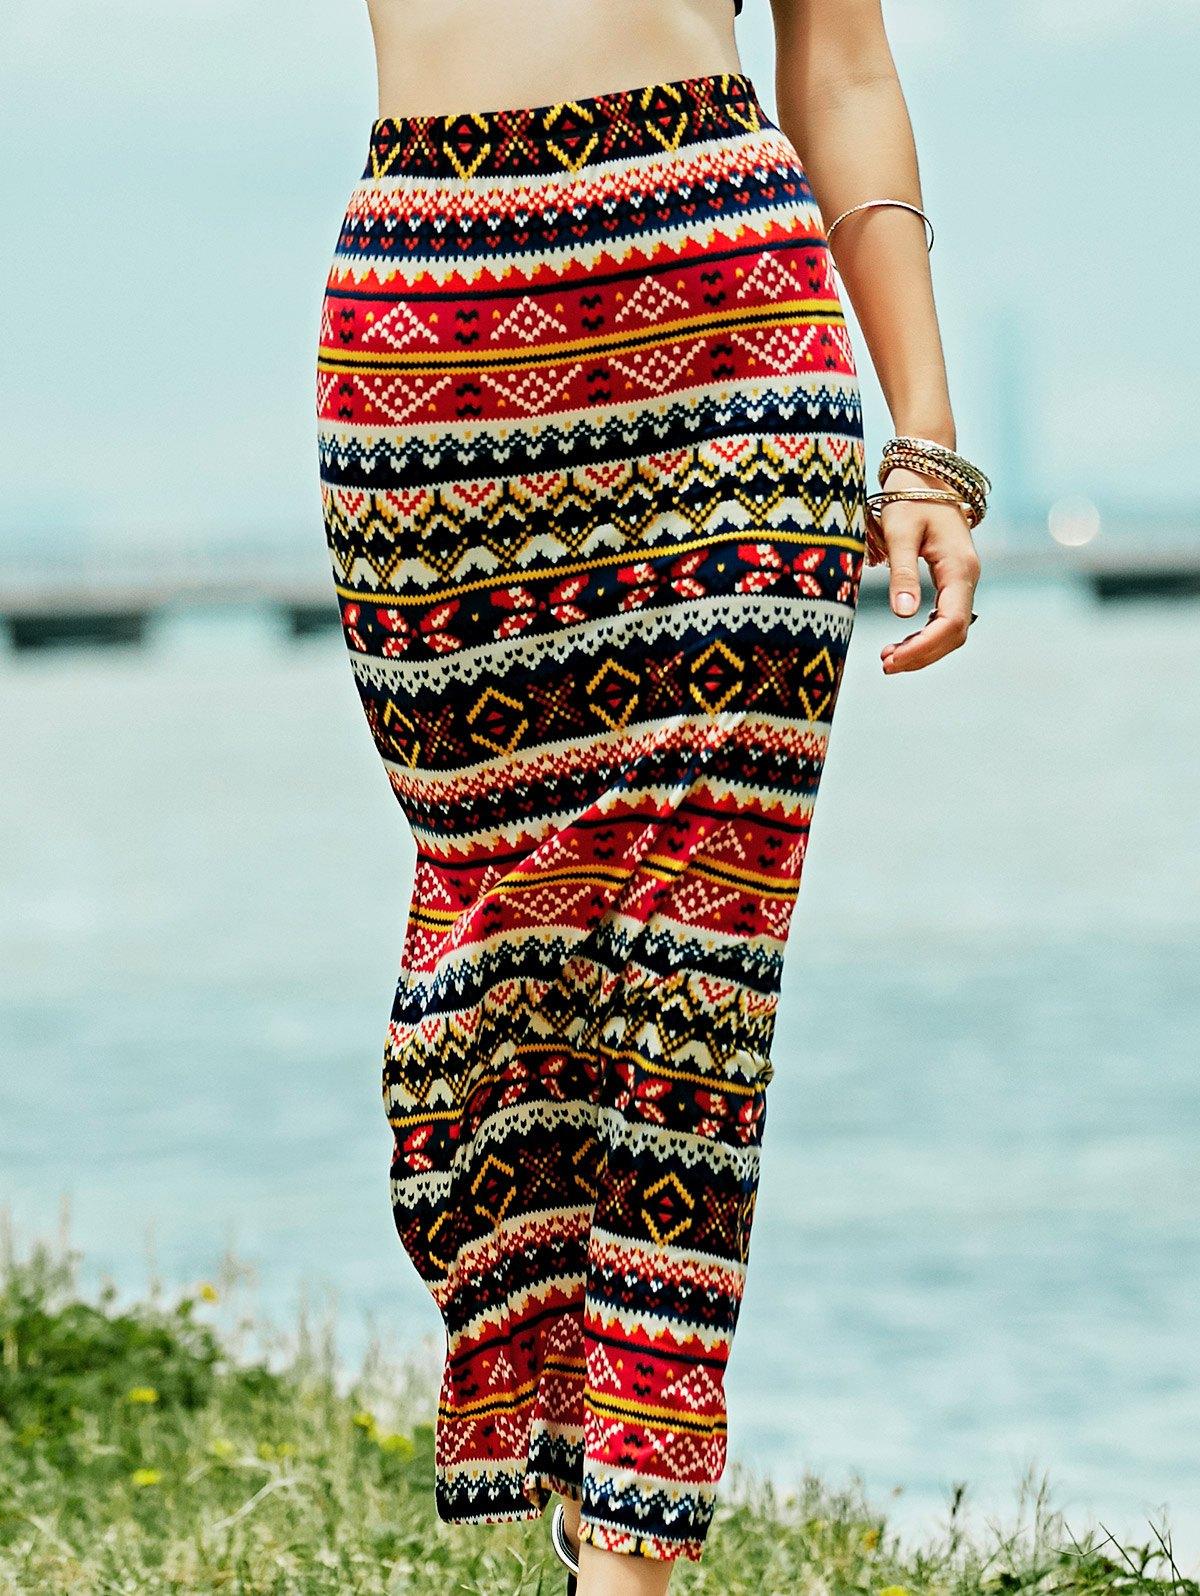 Geometric High Waist Slit Pencil Skirt